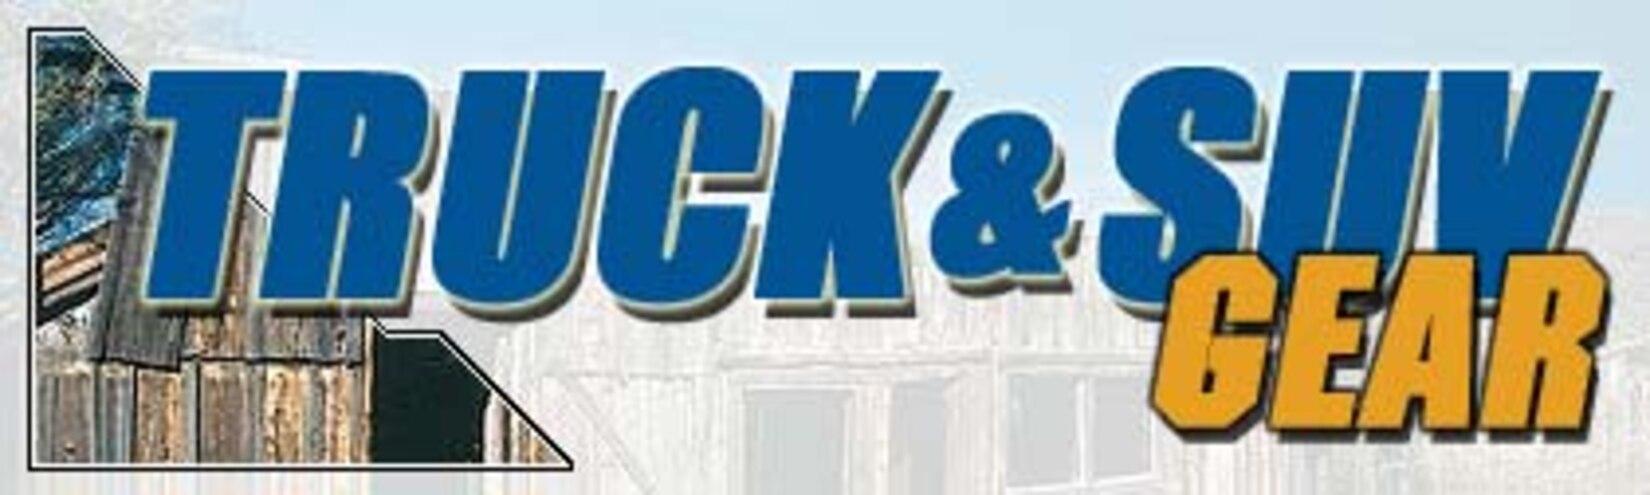 2004 TRUCK & SUV Gear